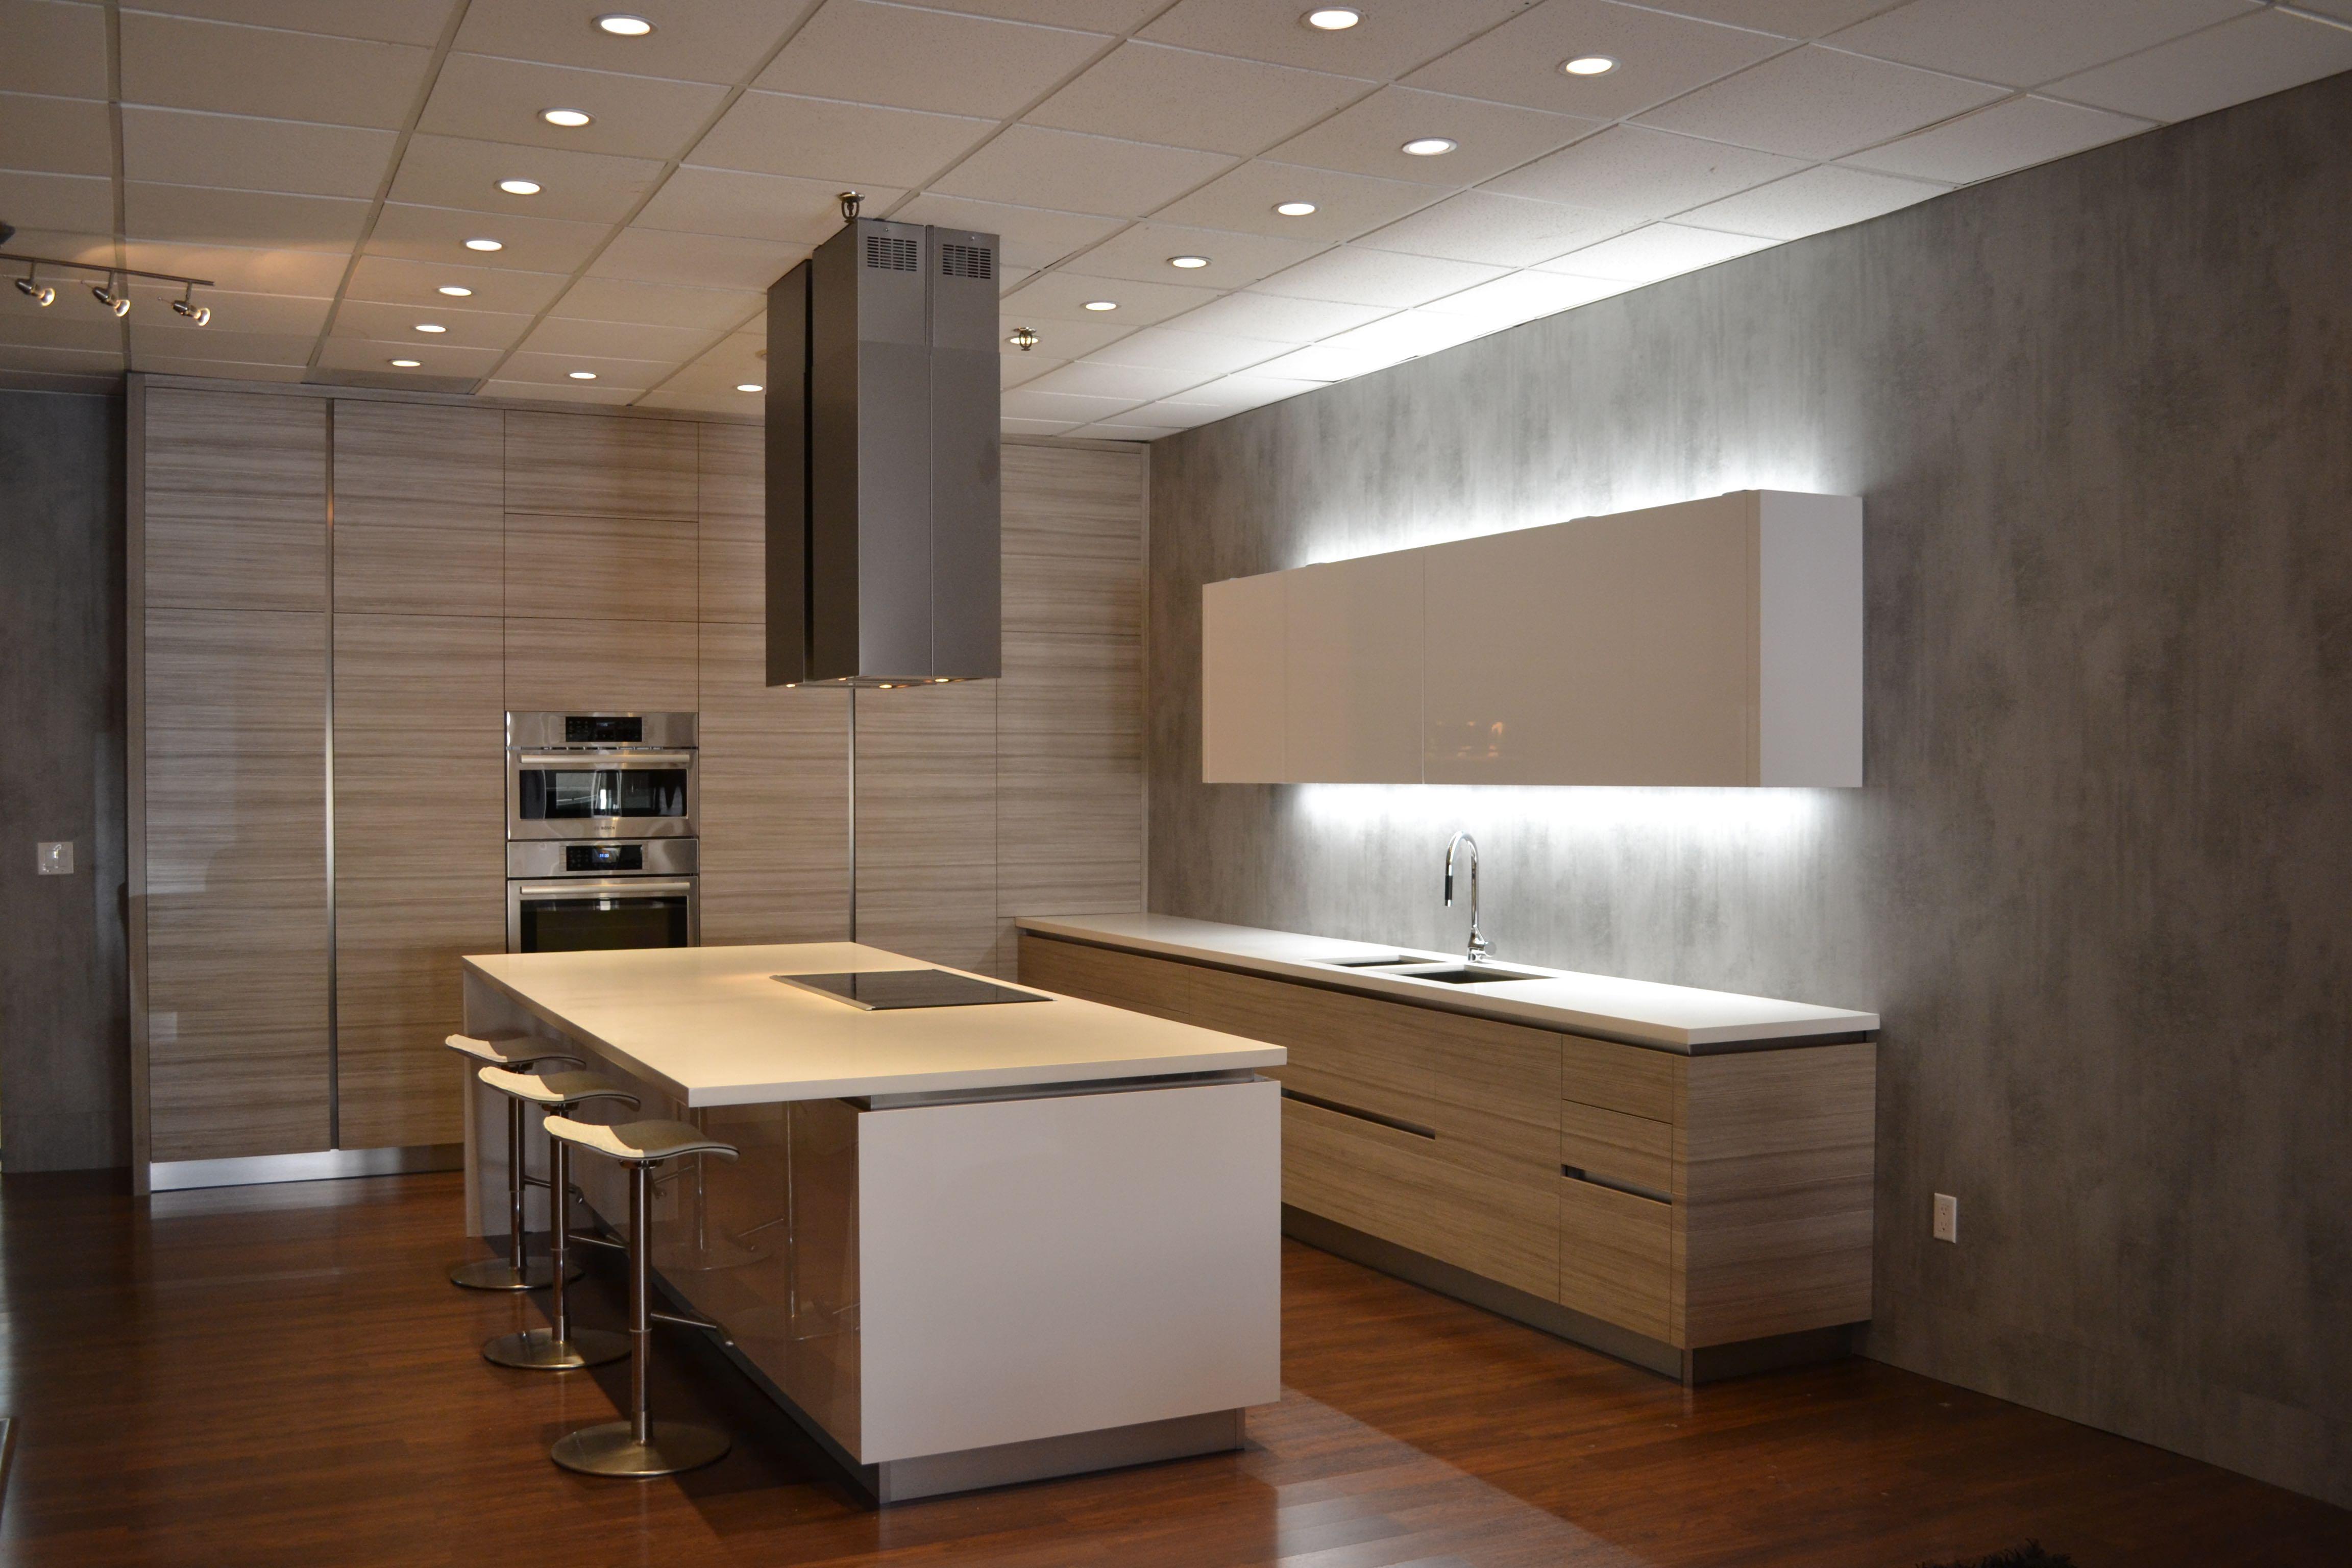 Cabinet Doors Textured Laminate laminate kitchen cabinets A modern kitchen with LK55 Etobicoke textured laminate cabinet doors in horizontal grain direction